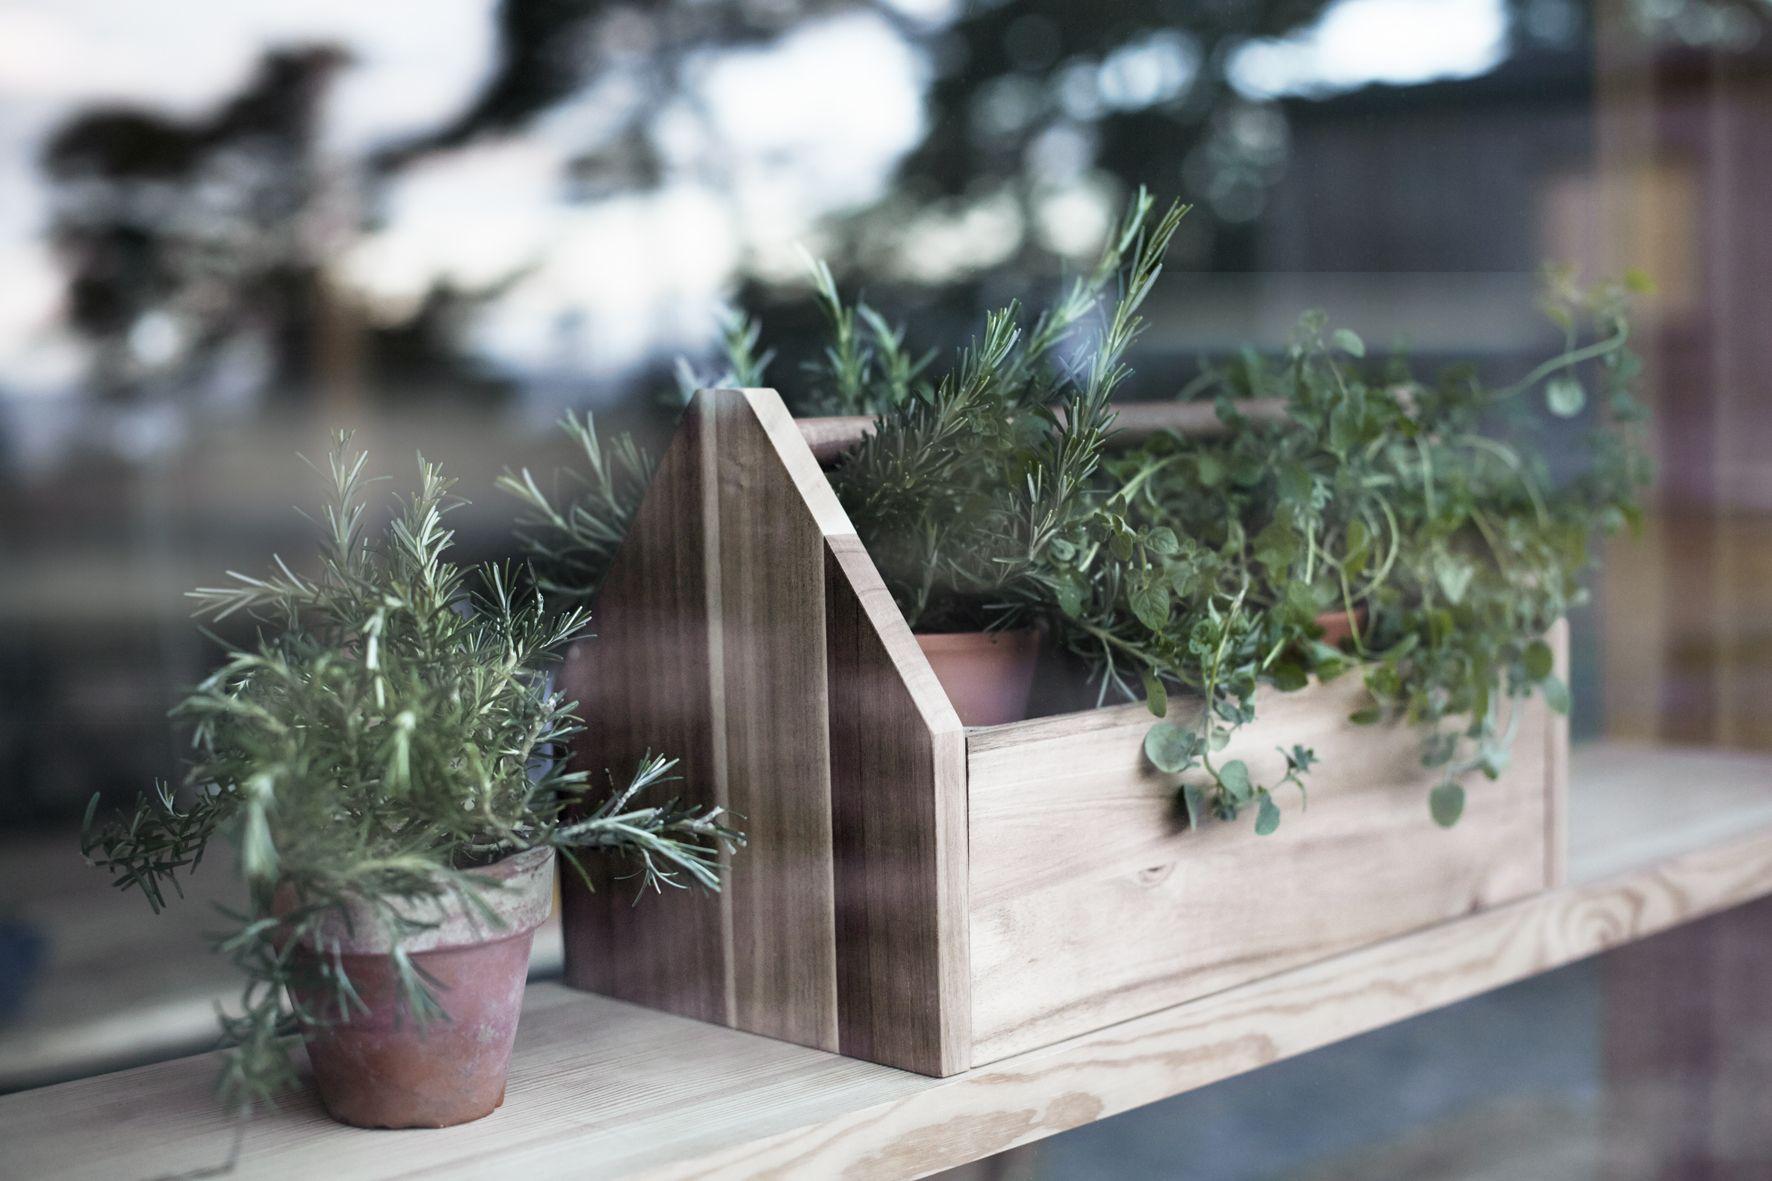 15x Eucalyptus Huis : Skogsta kistje met handgreep acacia keukens pinterest